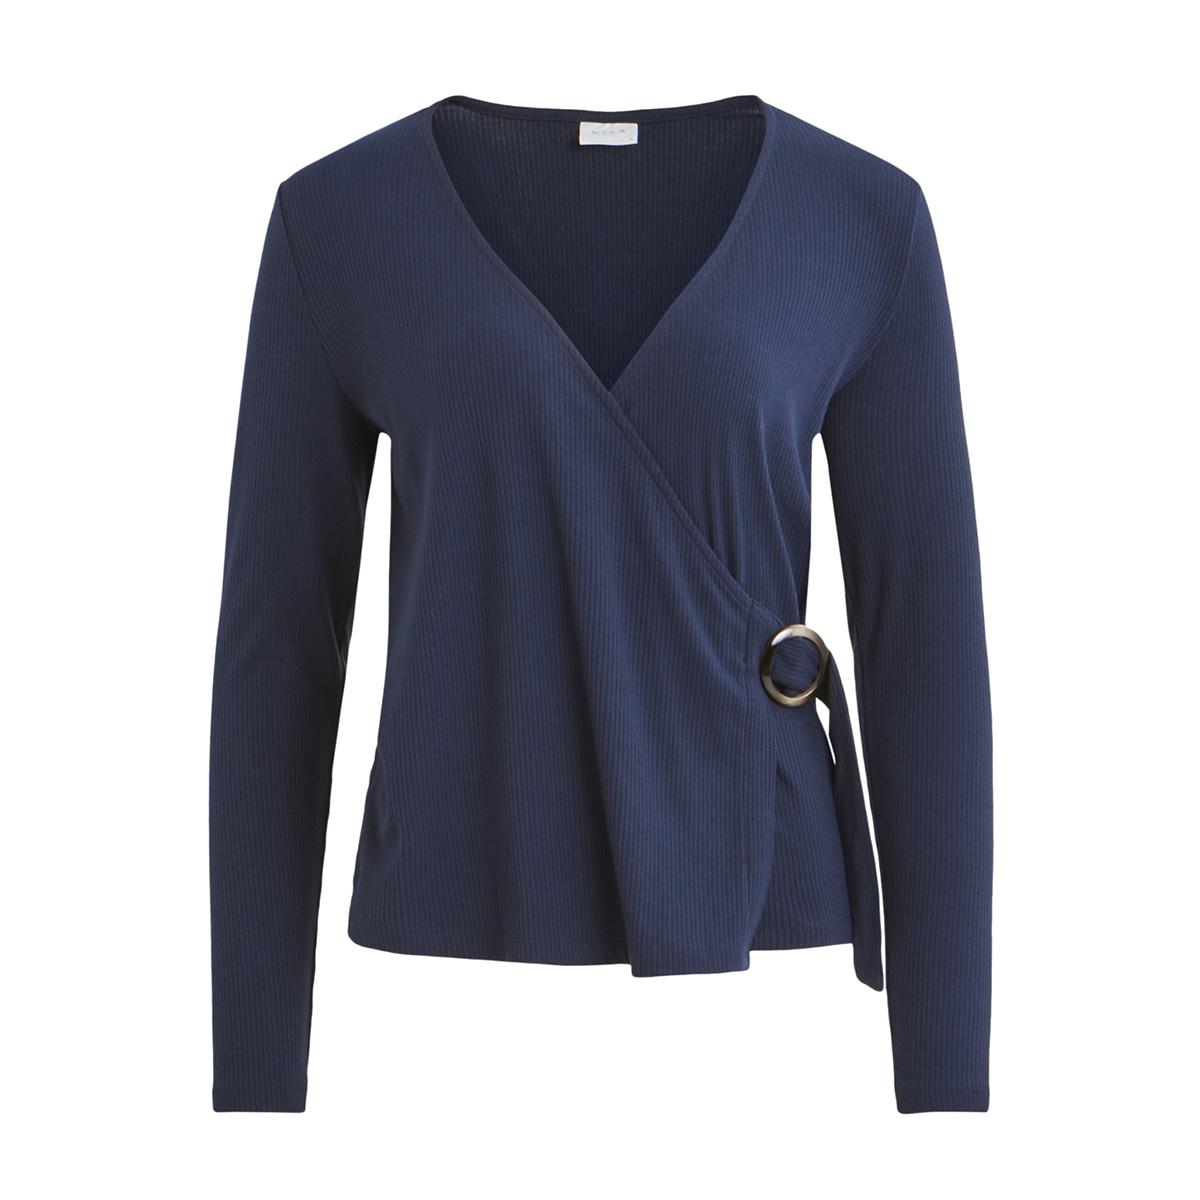 vibola l/s top/ki 14053619 vila t-shirt navy blazer